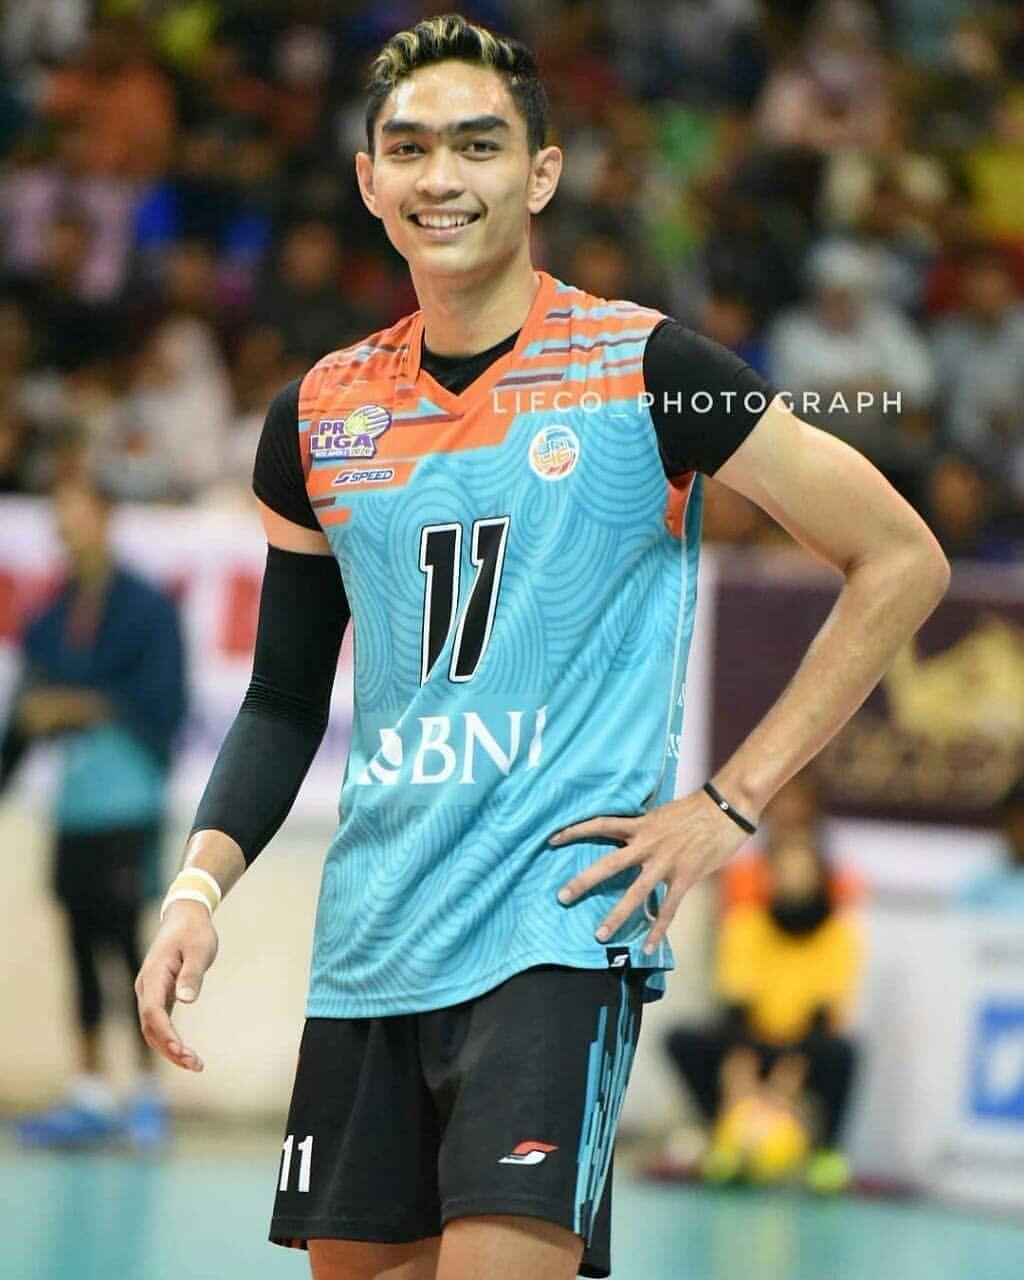 Pin Oleh Viona Octavia Di Volleyball Di 2020 Atlet Pacar Pria Pria